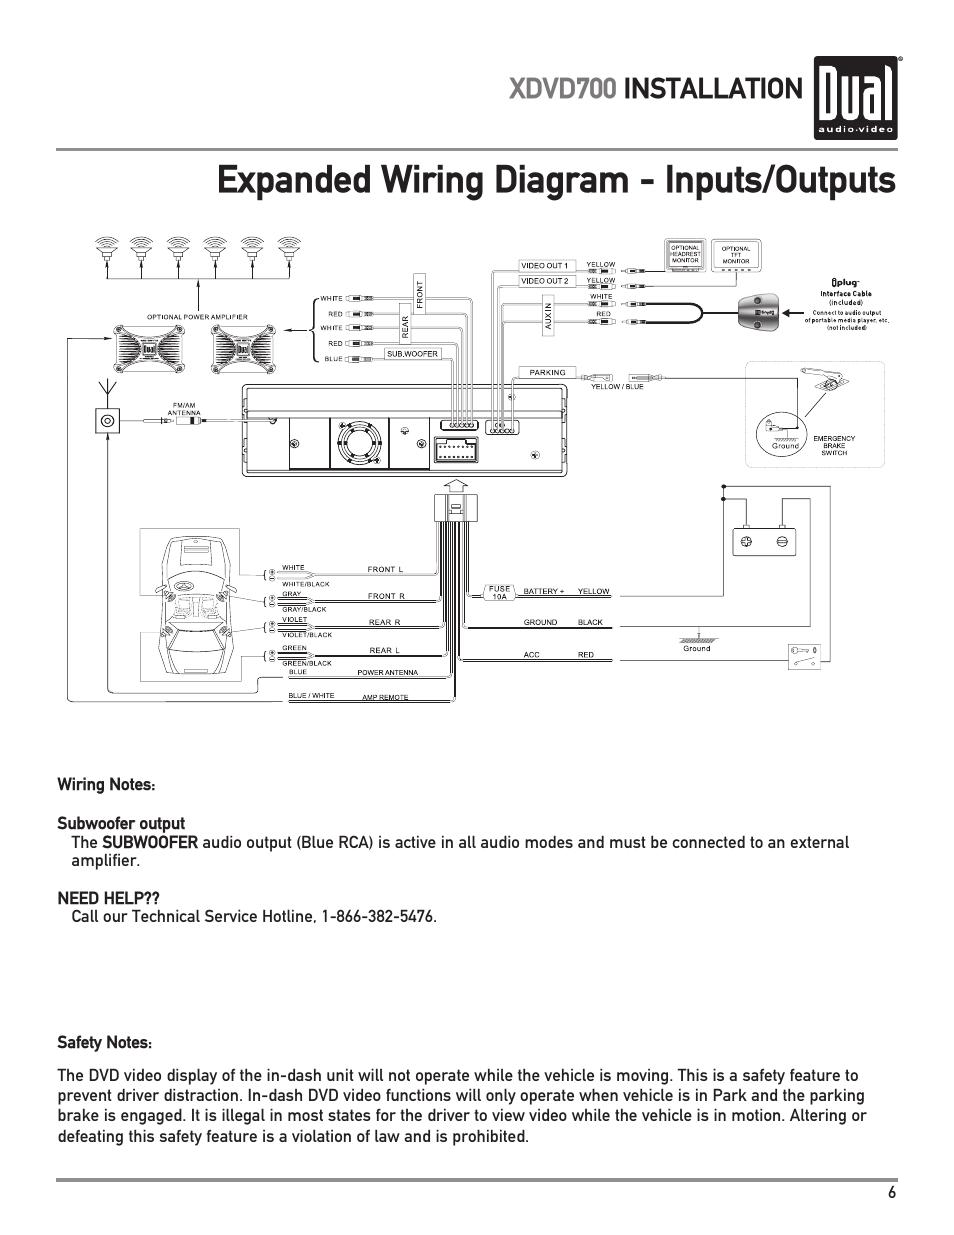 dual cd770 wiring harness diagram wiring diagram section  dual model xd1222 wiring diagram #14